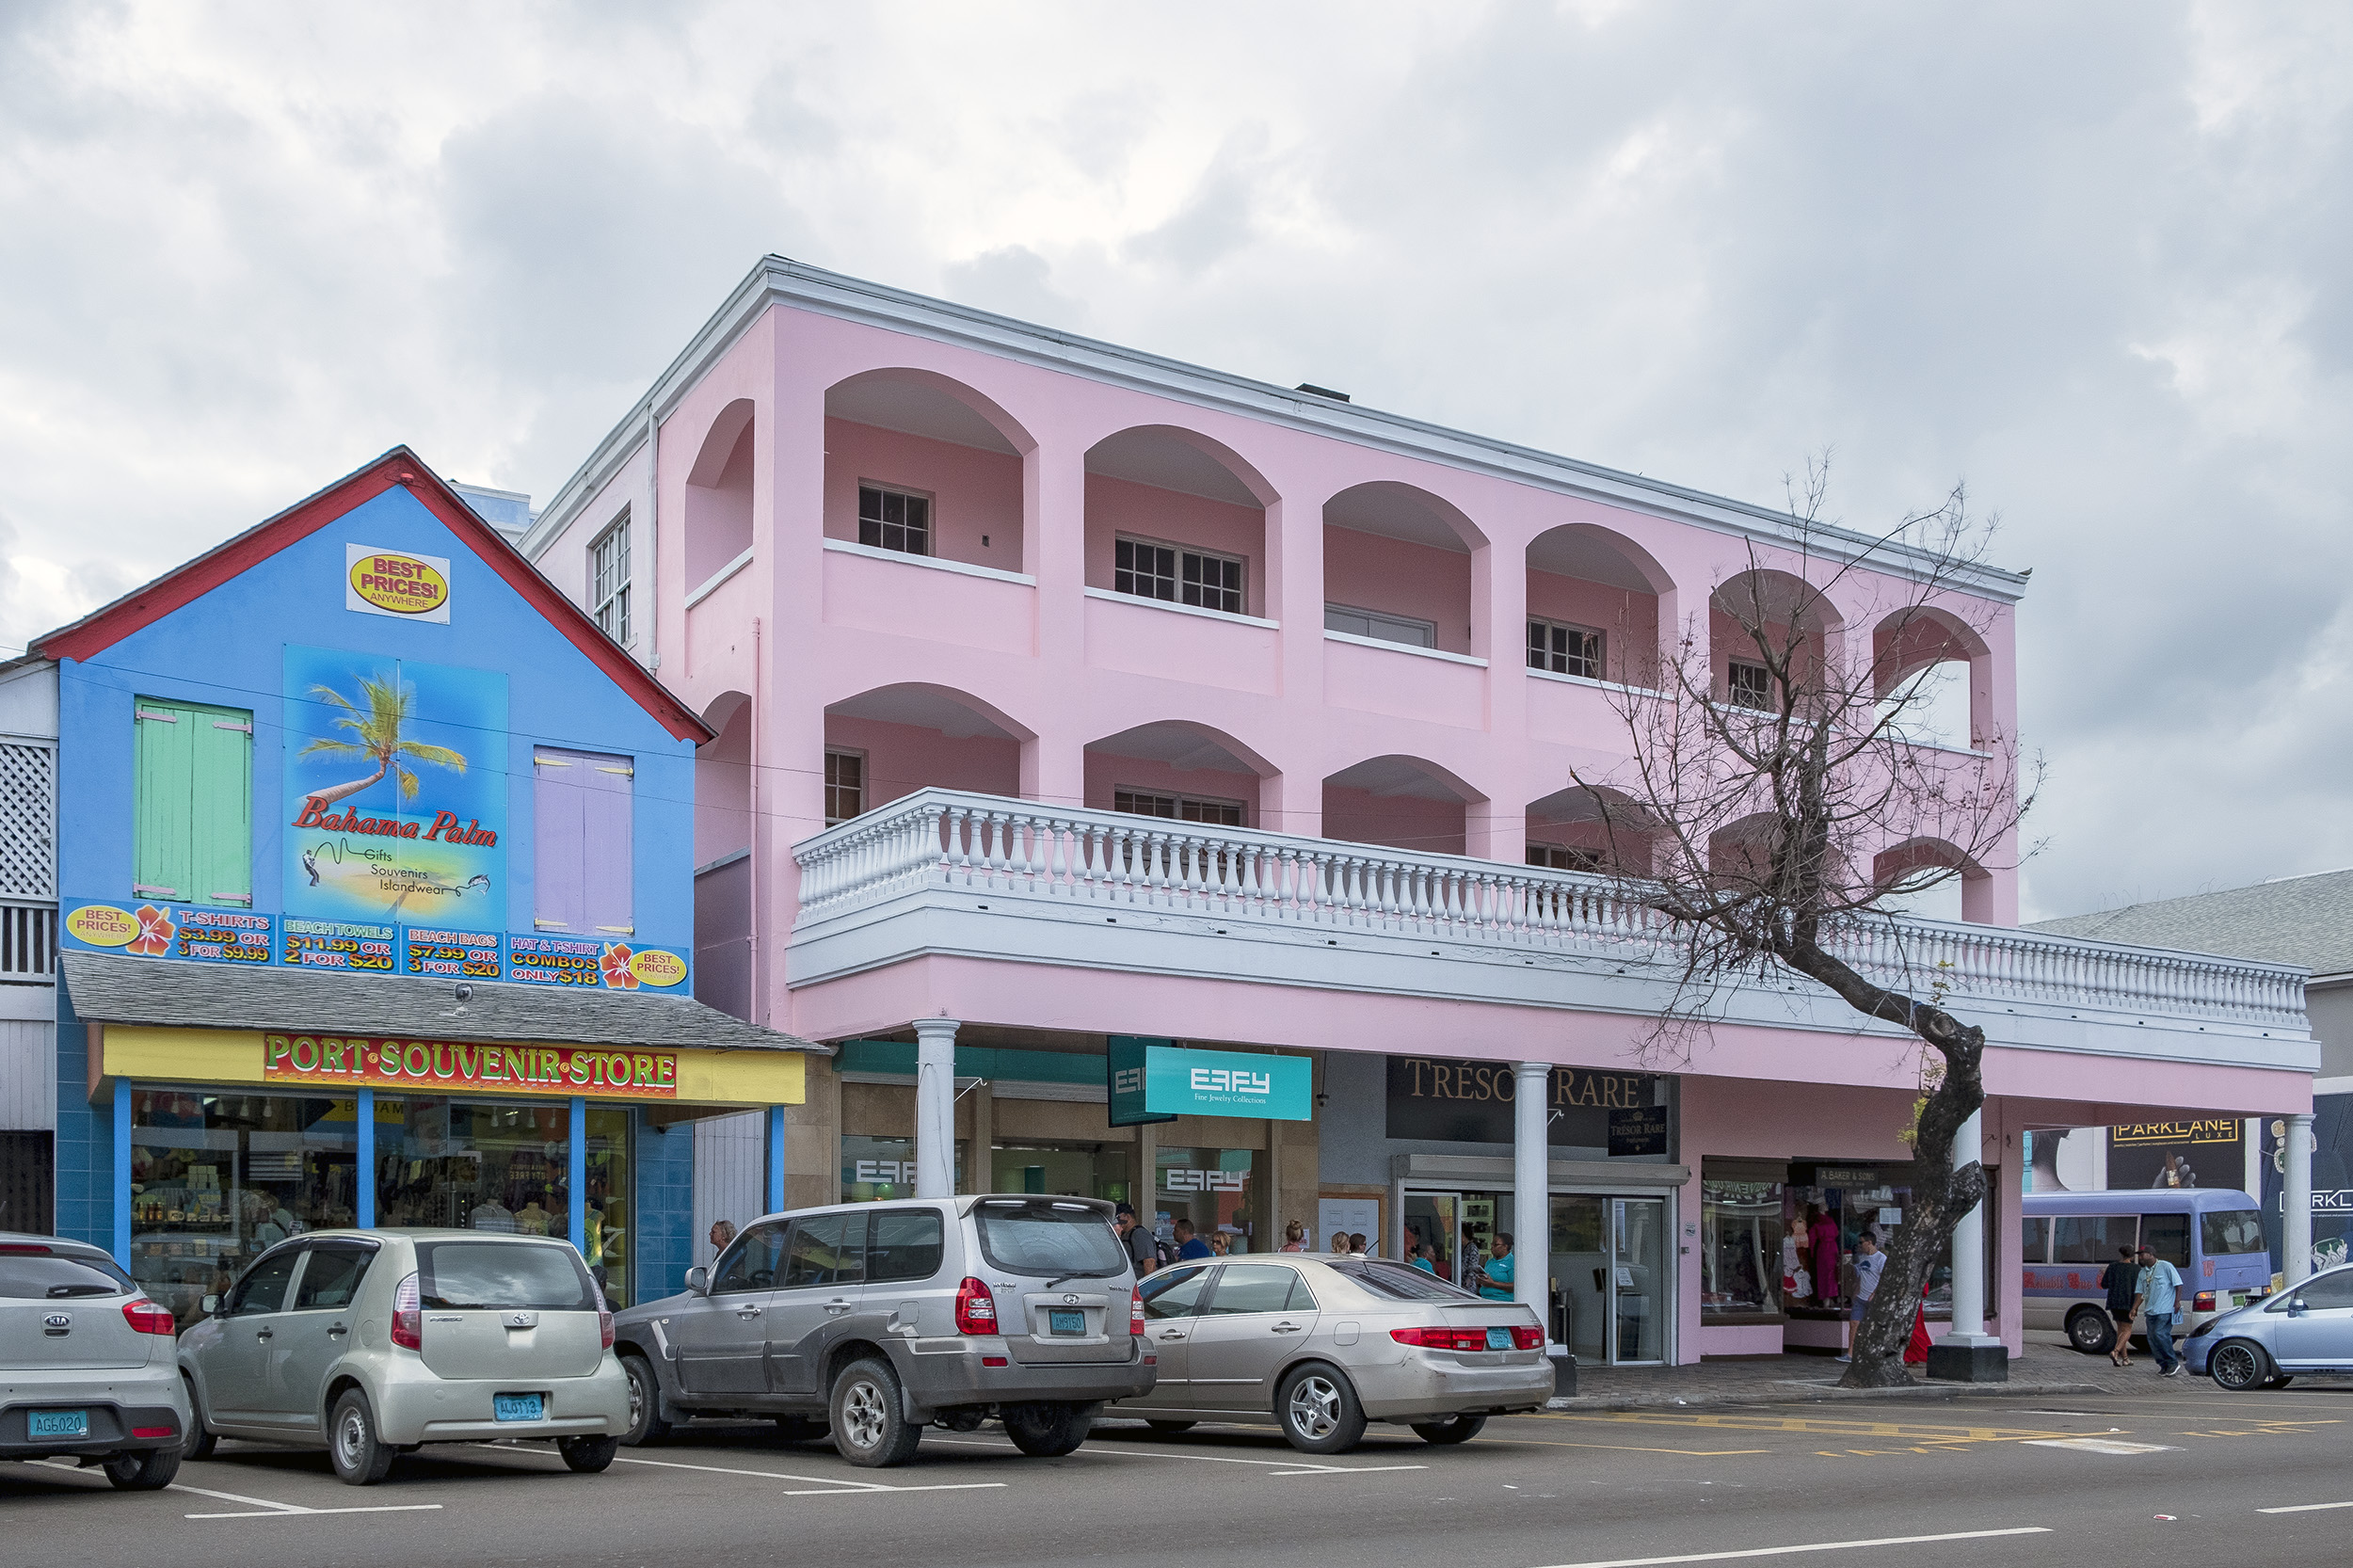 Bay Street Nassau Bahamas